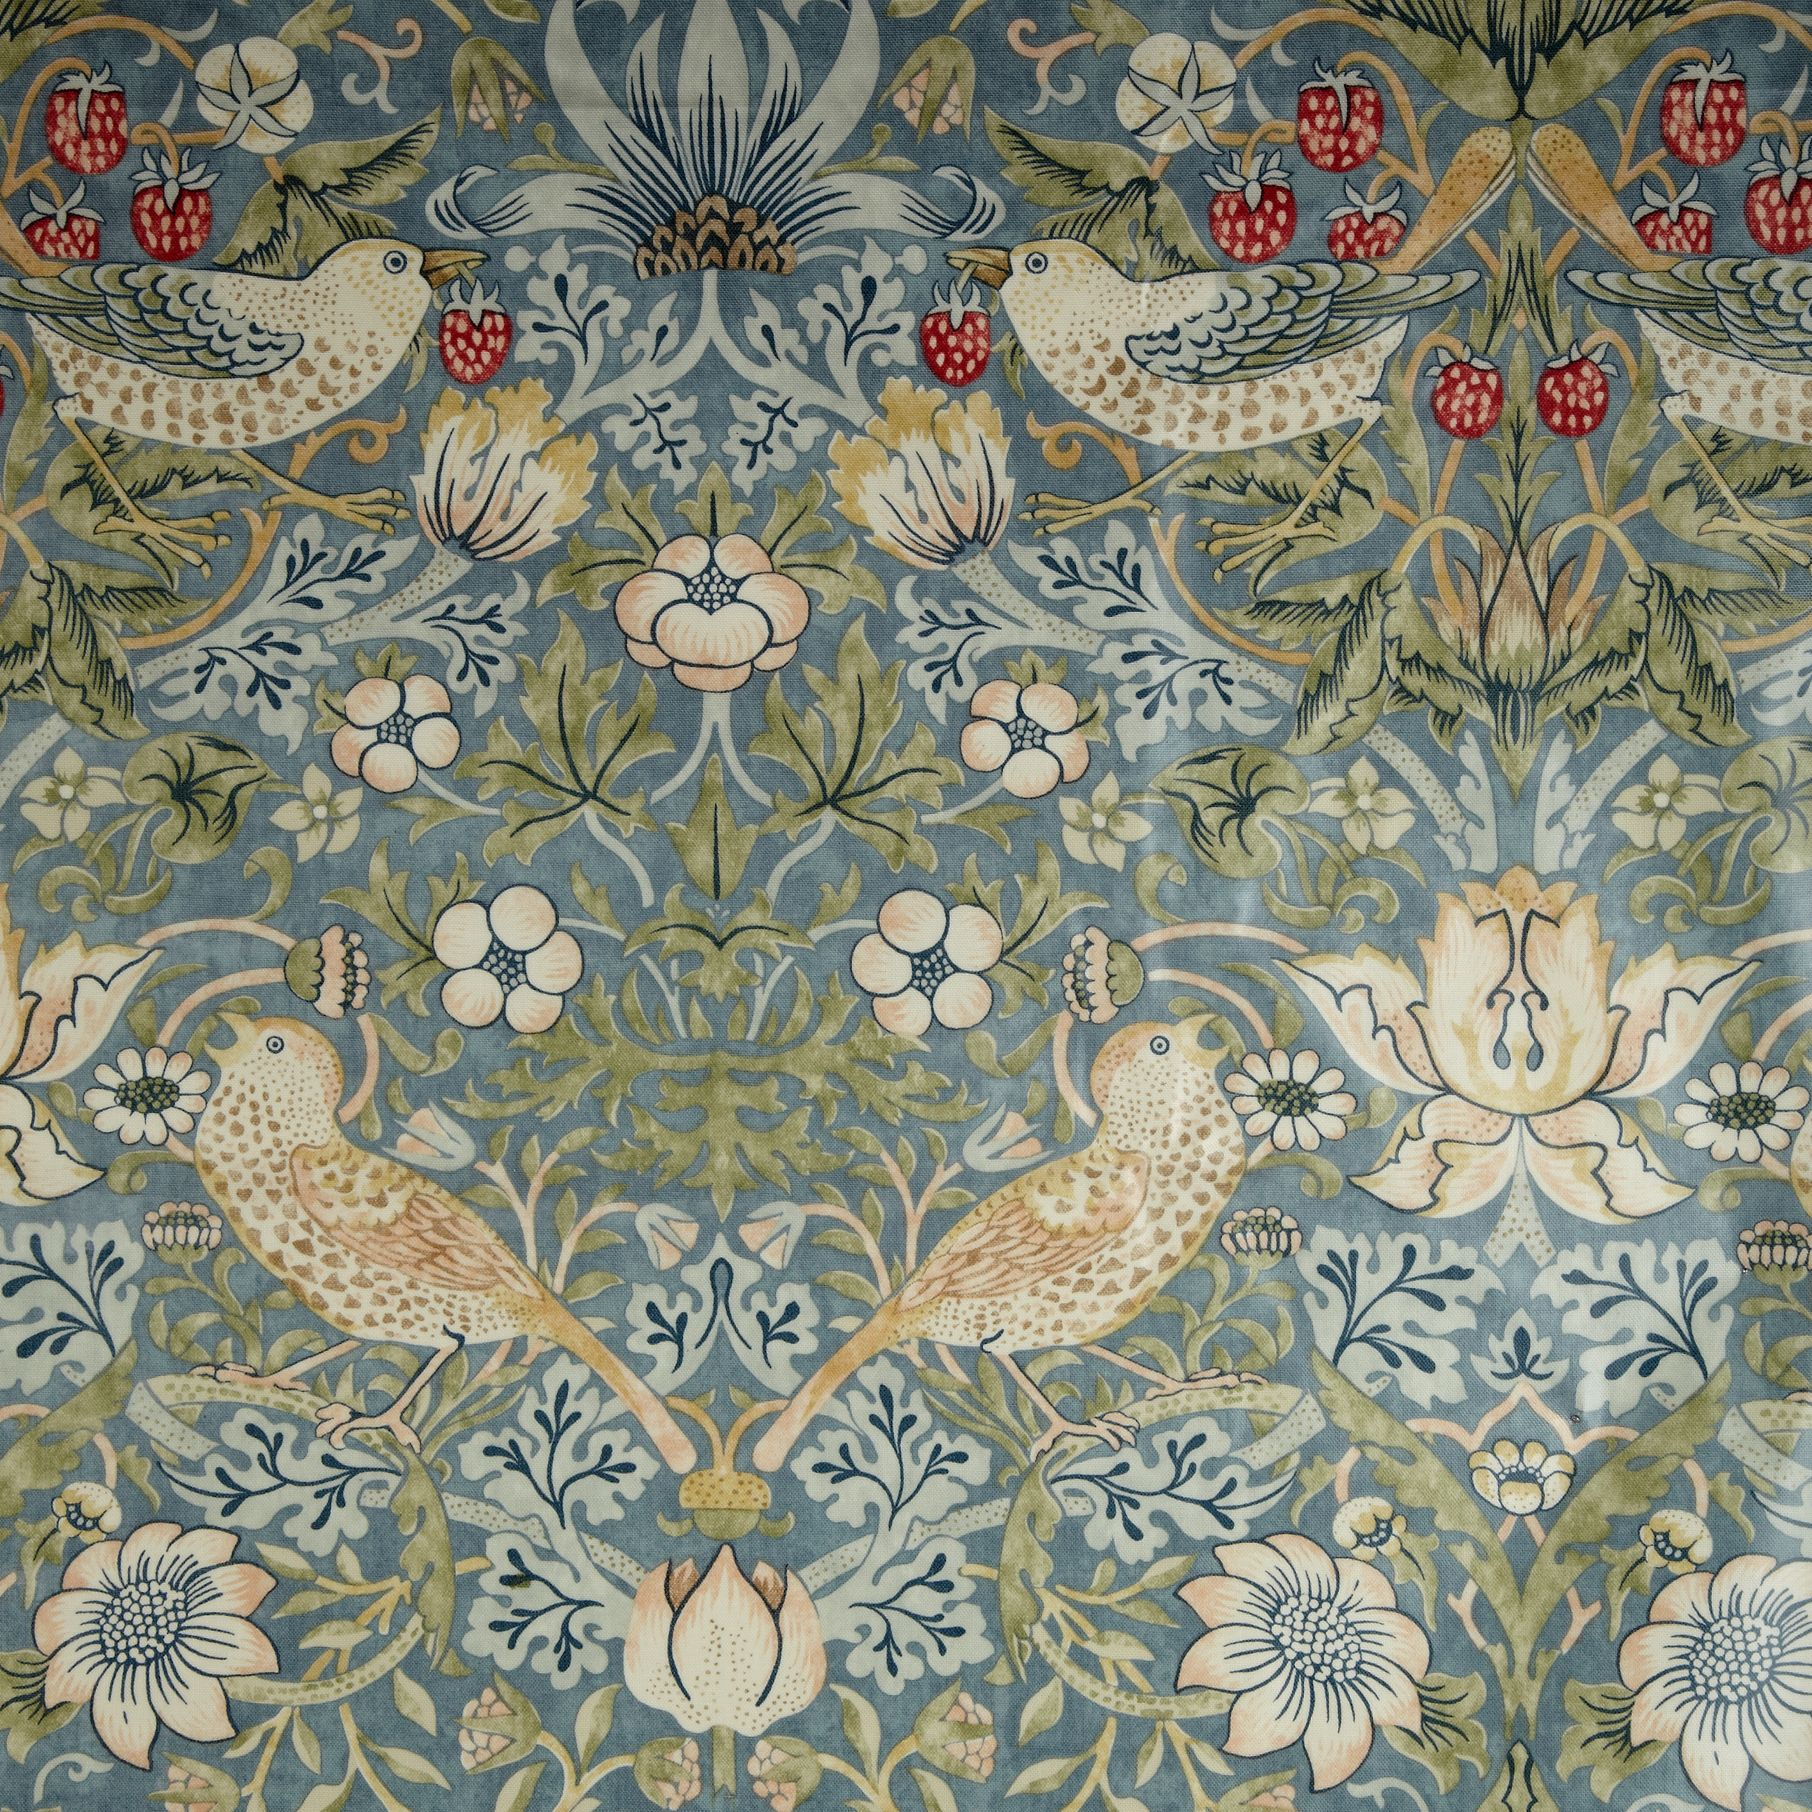 Morris & Co. Strawberry Thief PVC Tablecloth Fabric